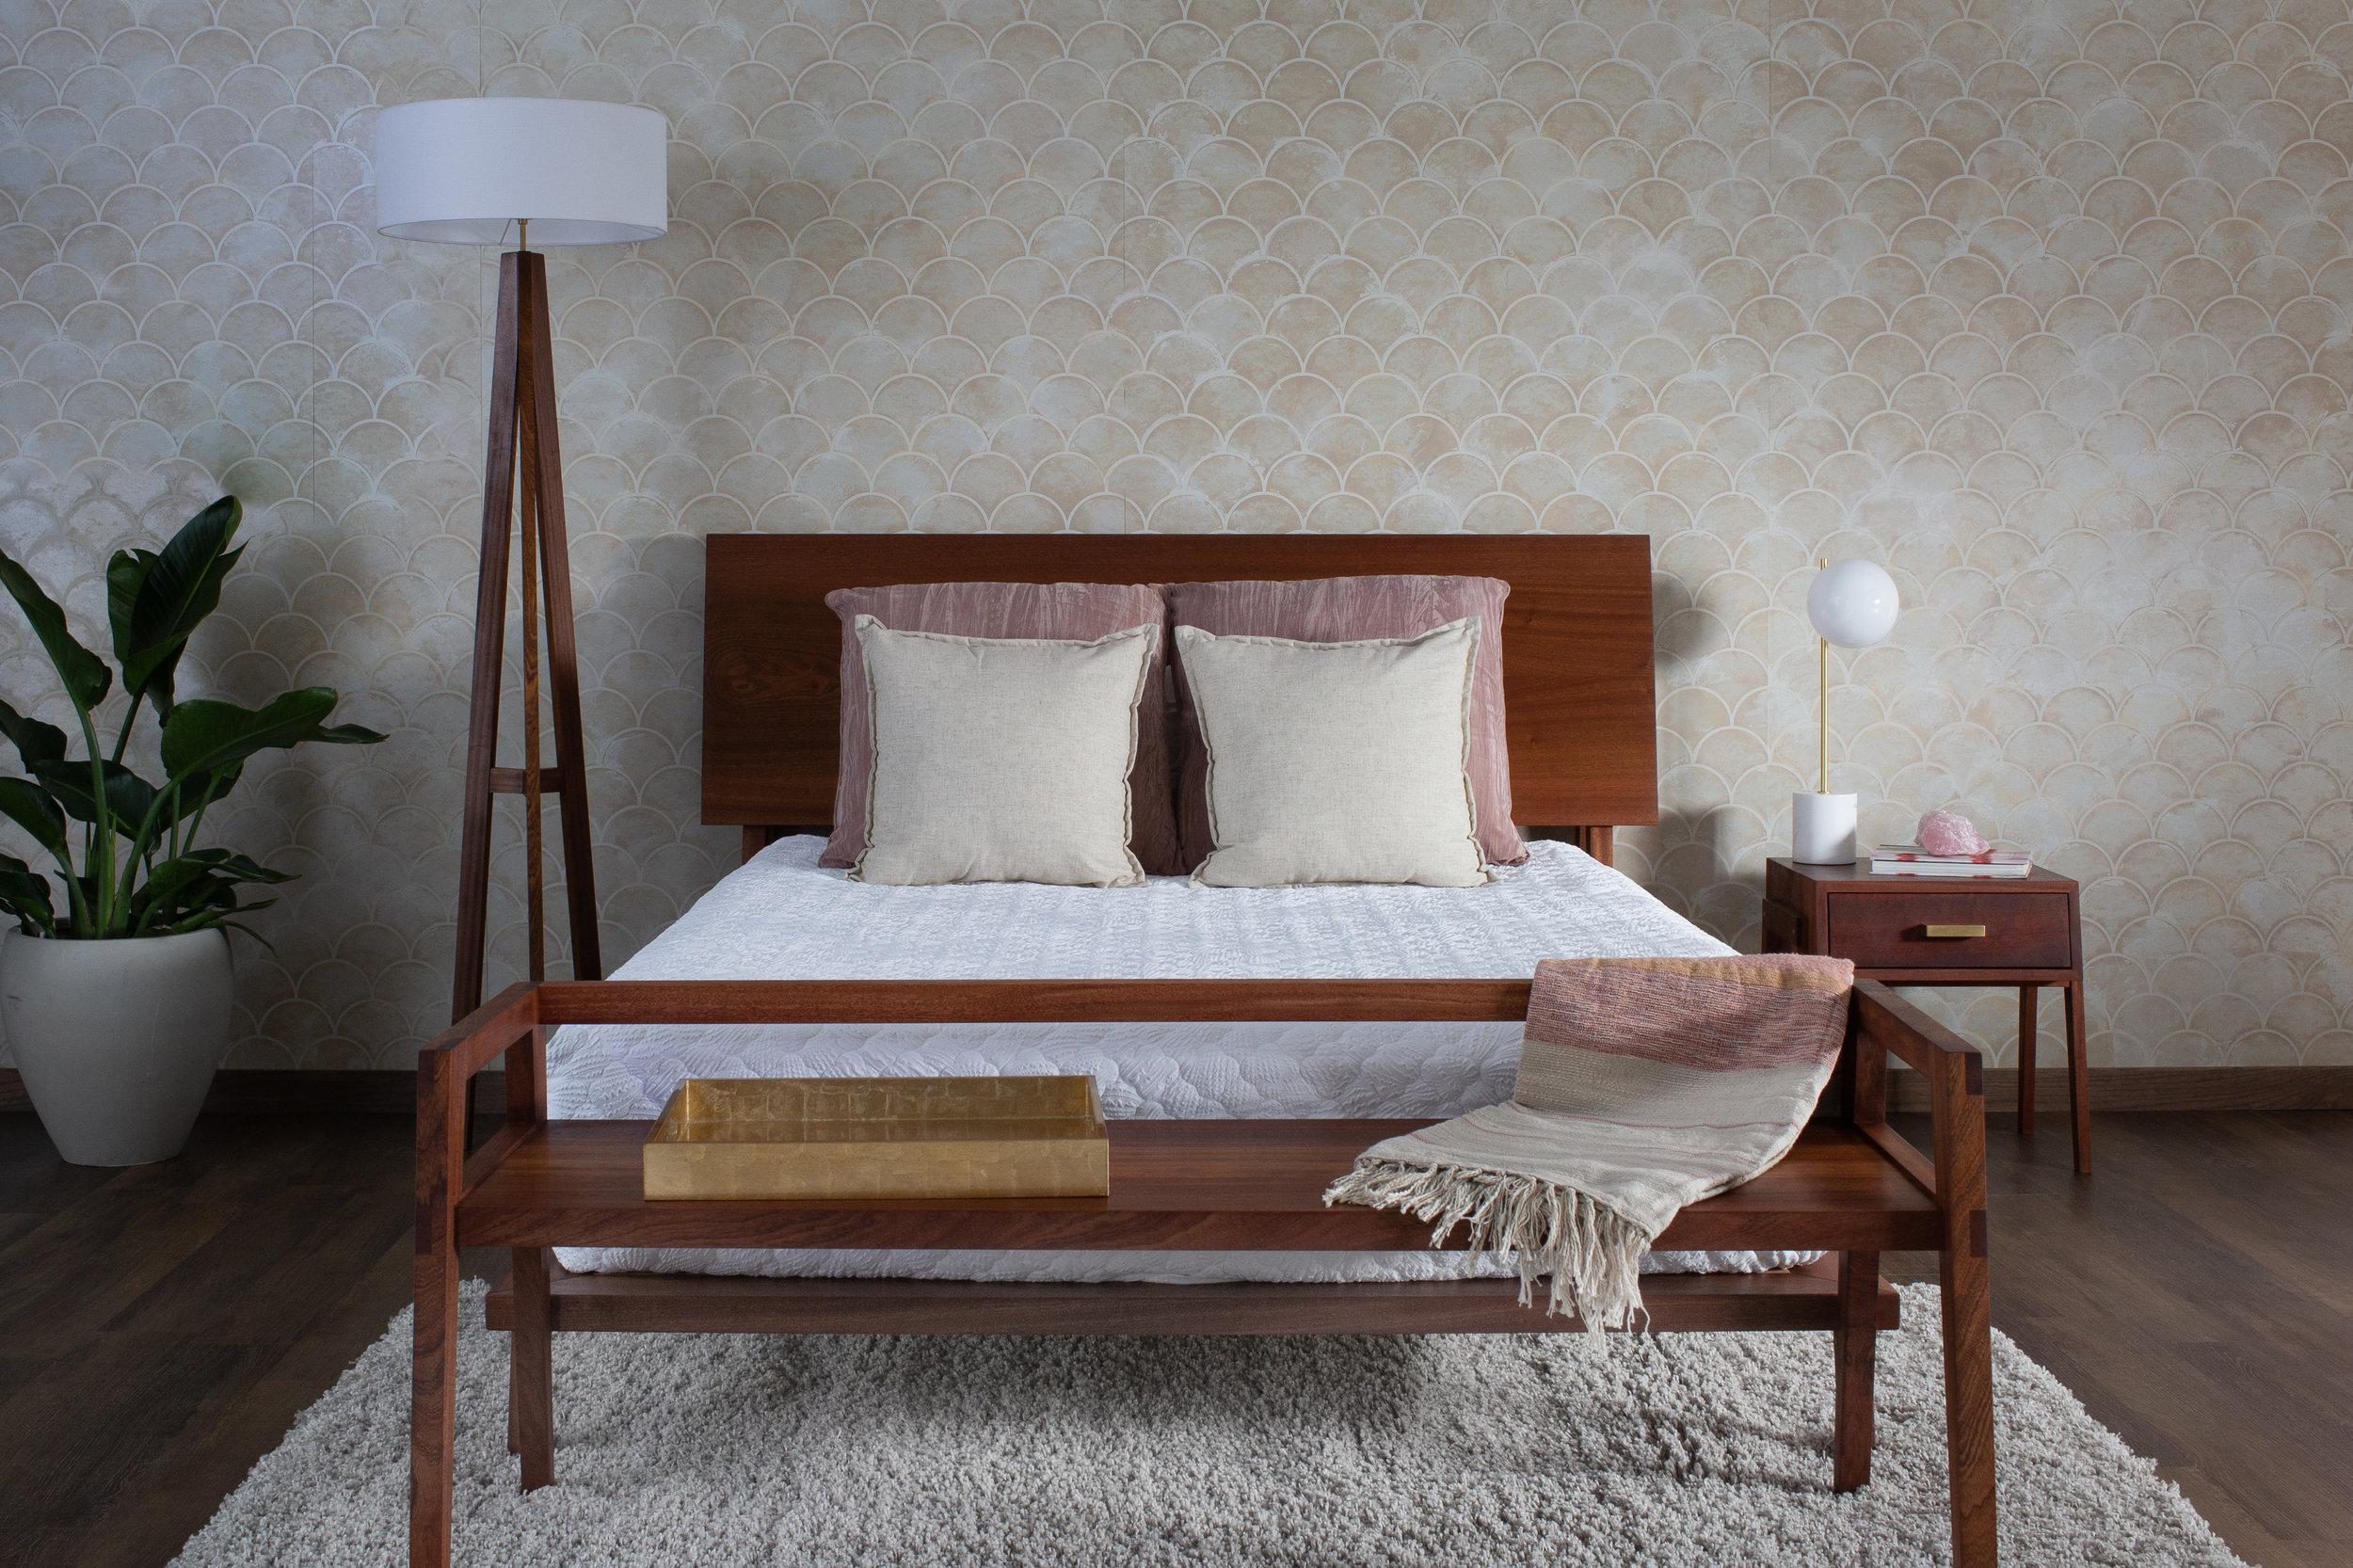 Bedroom_0306.jpg